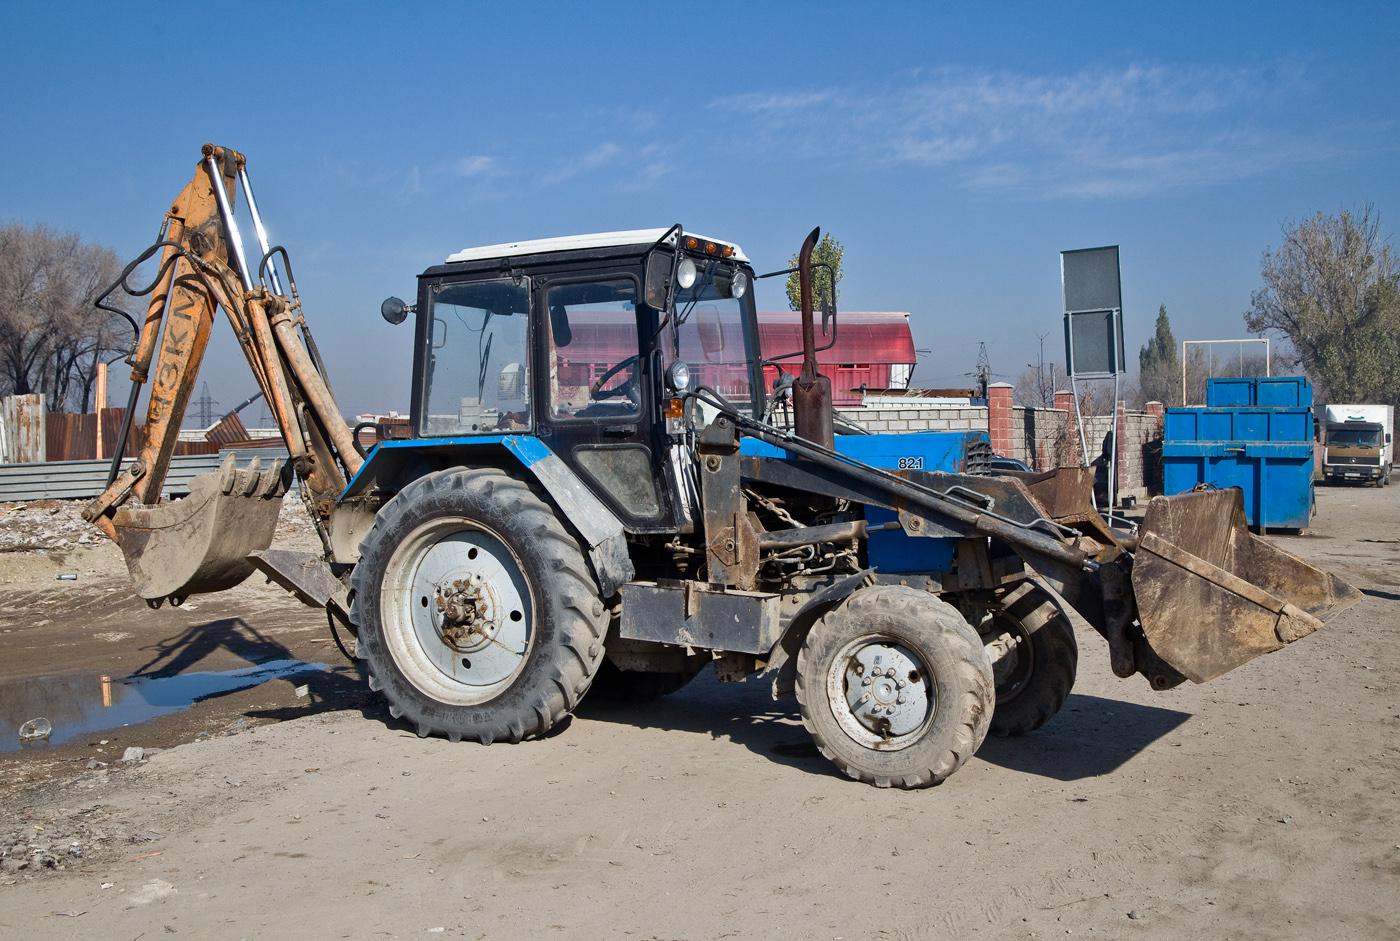 Экскаватор-погрузчик ЭО-2626 на базе трактора Беларус 82.1 #A 852 ACD. Алматы, проспект Рыскулова